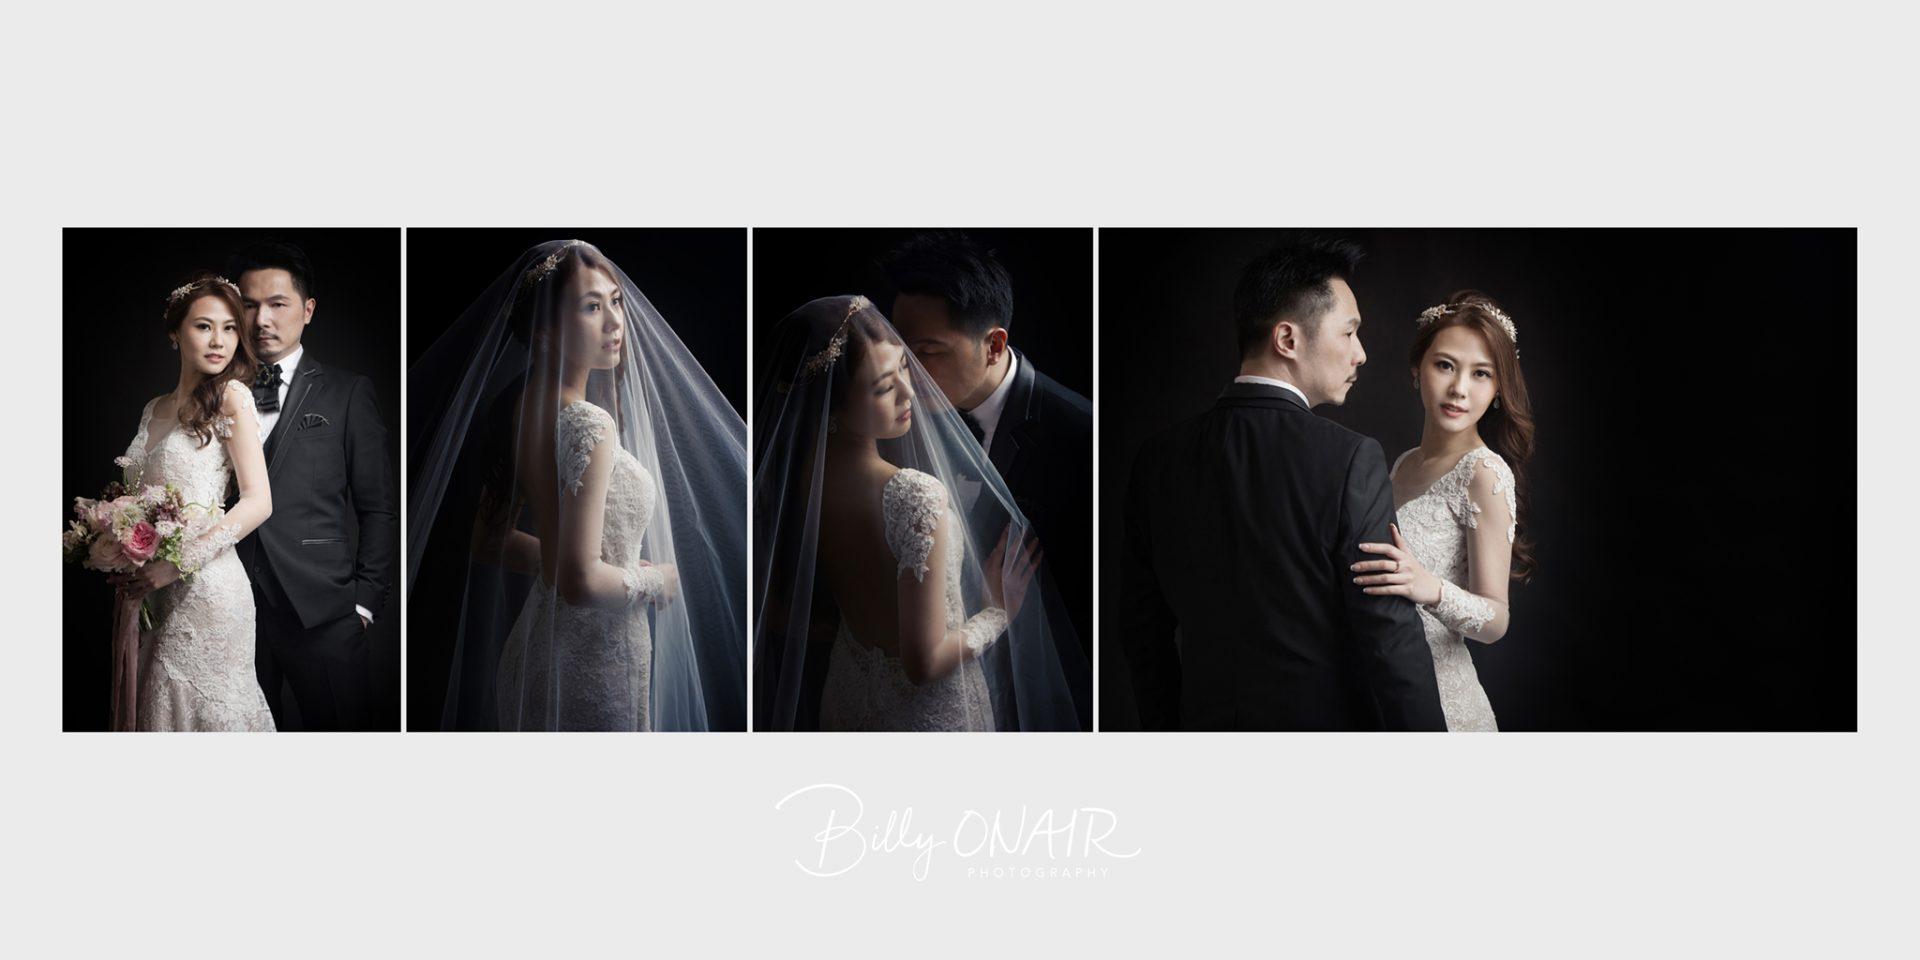 hk_pre_wedding_06